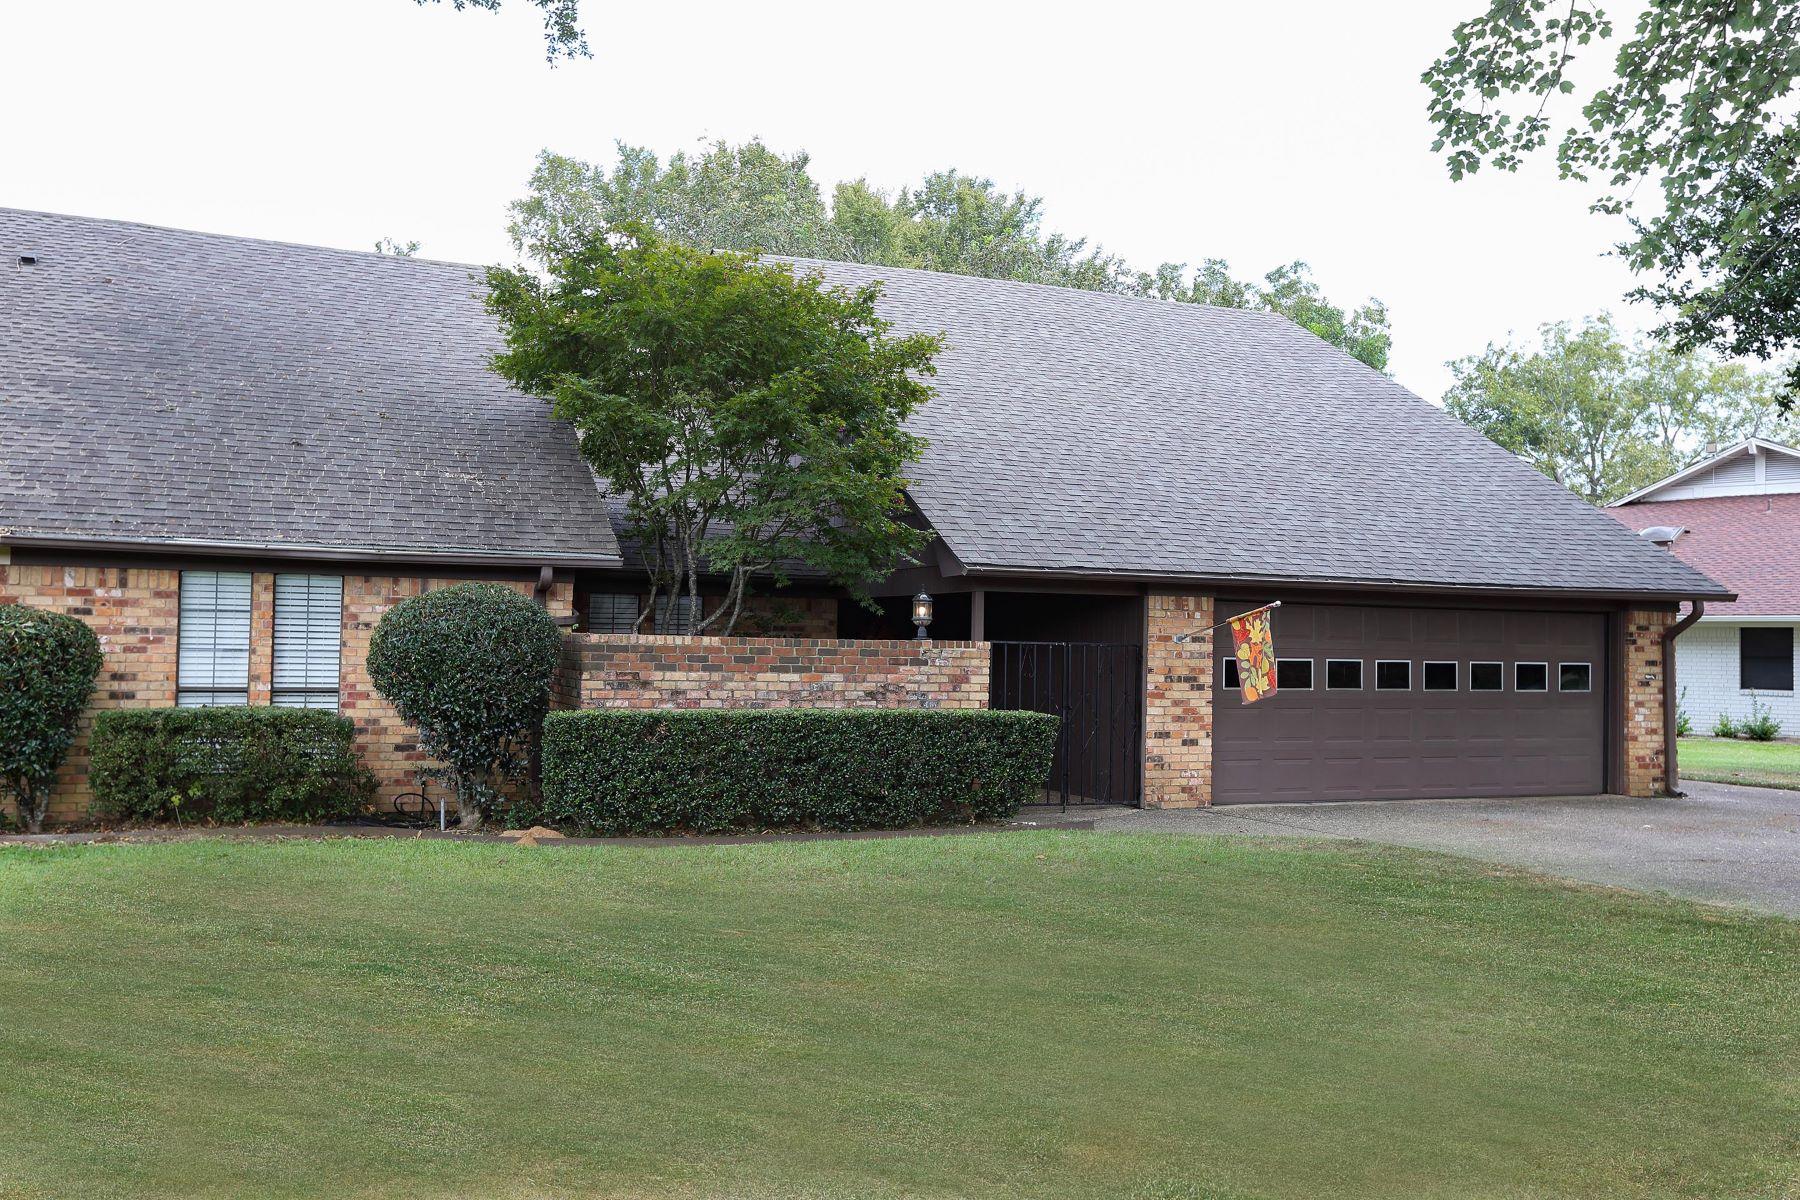 Duplex Homes for Sale at 150 S. Bay Drive Bullard, Texas 75757 United States